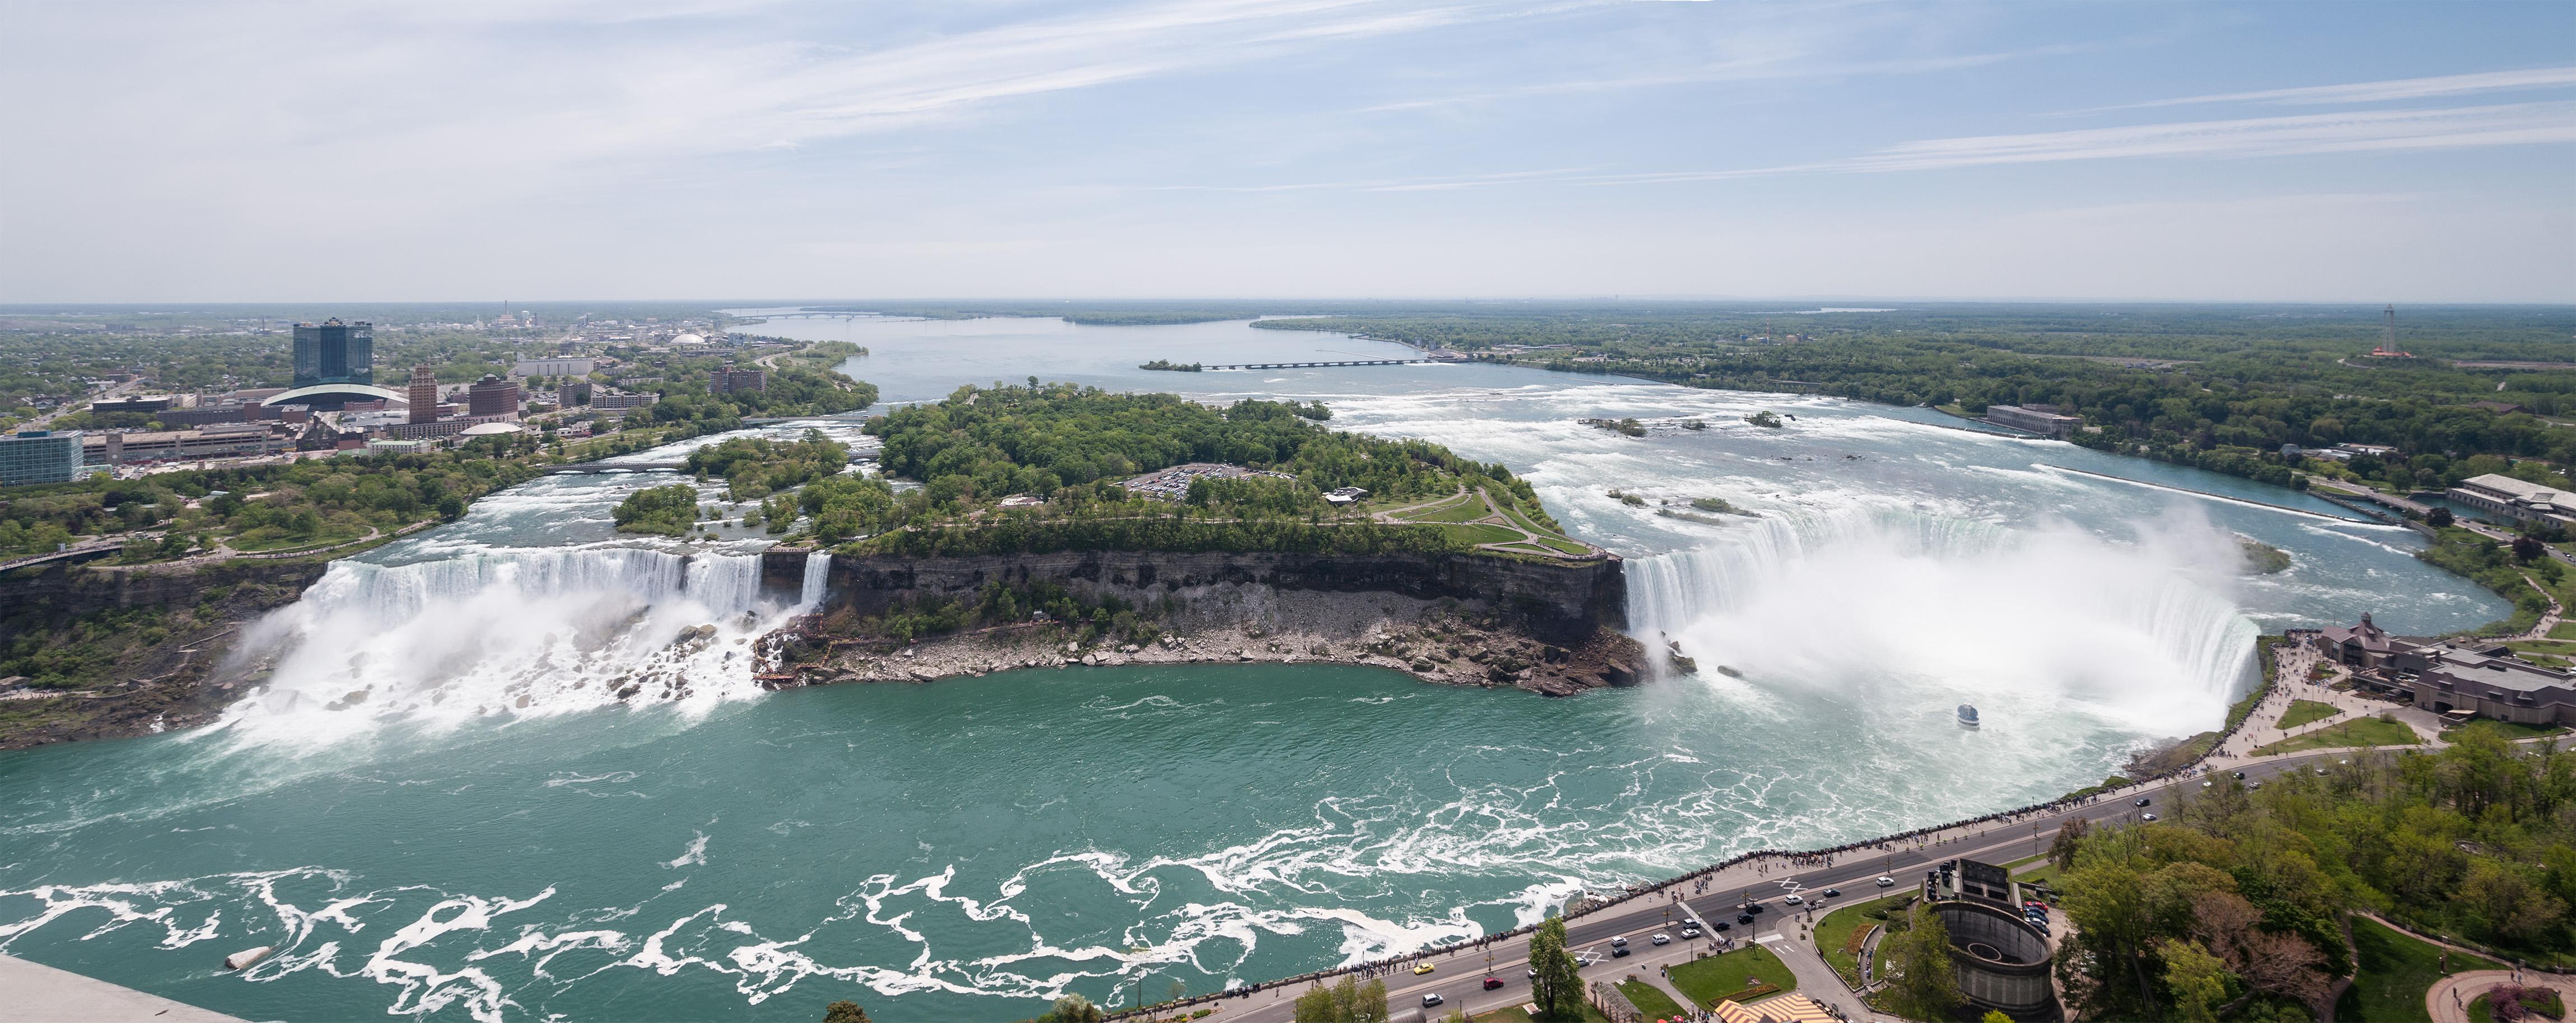 Niagara Falls seen from Skylon Tower, left: Br...